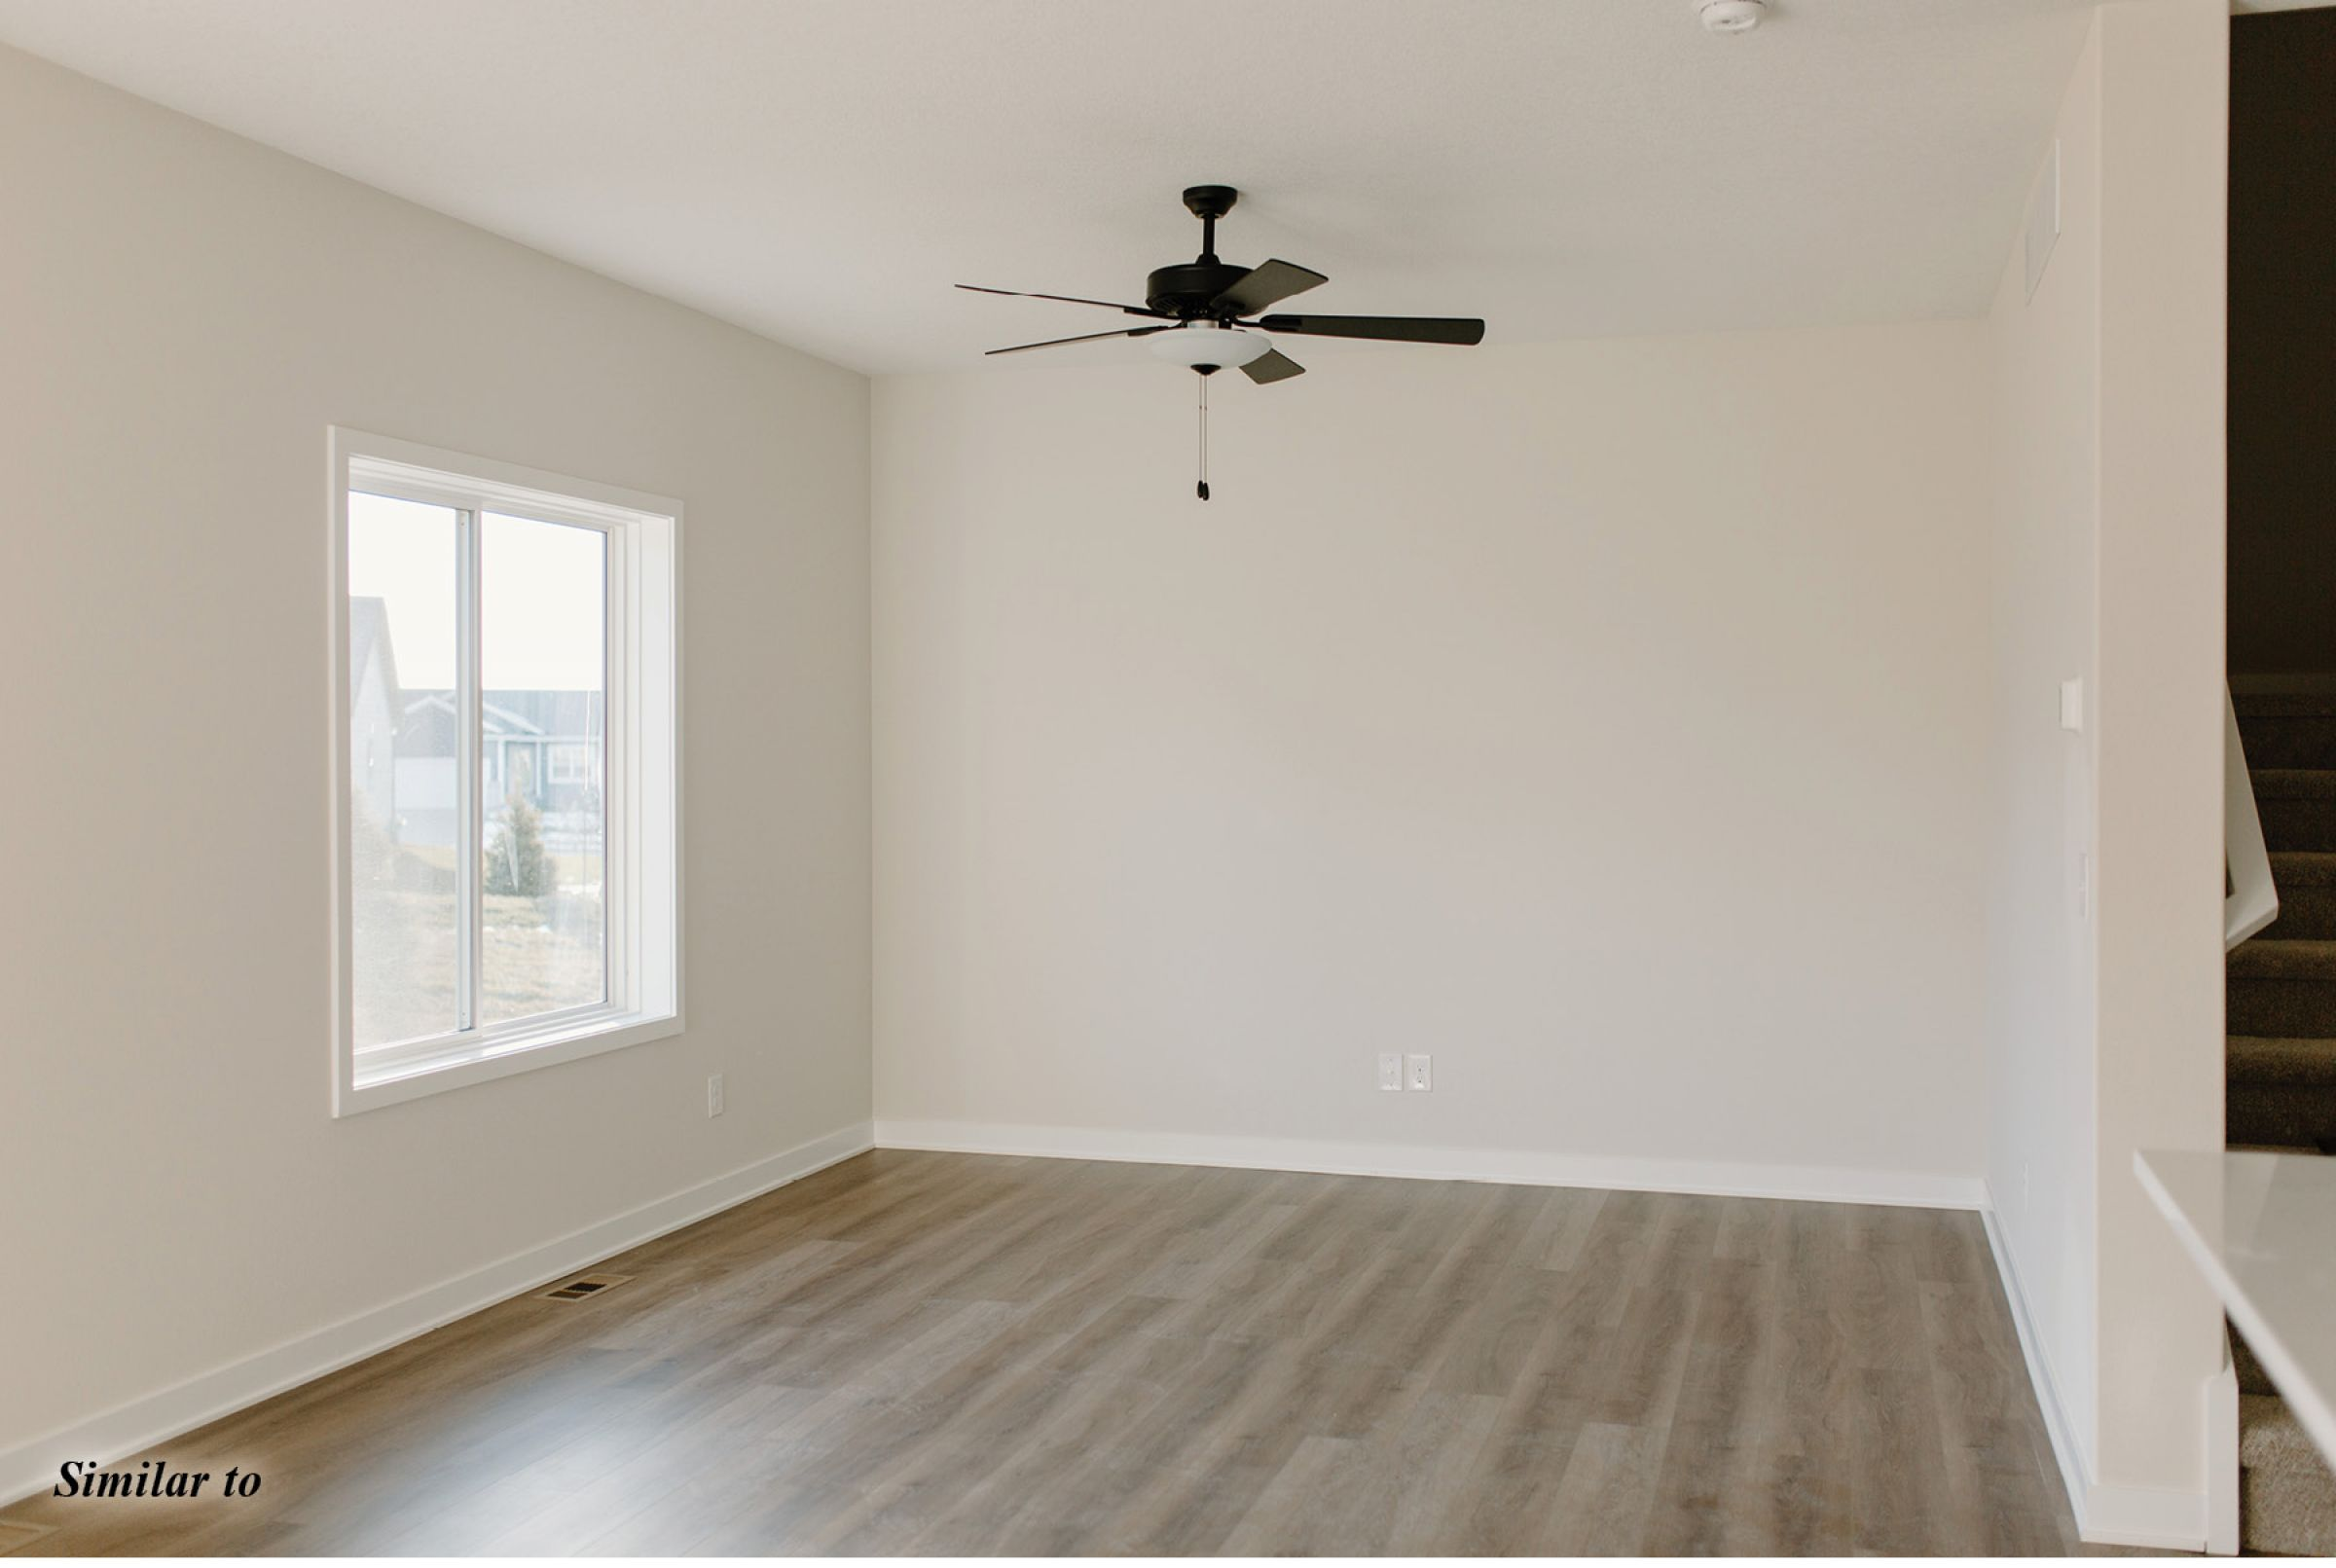 residential-warren-county-iowa-0-acres-listing-number-15675-5-2021-08-06-141916.jpg